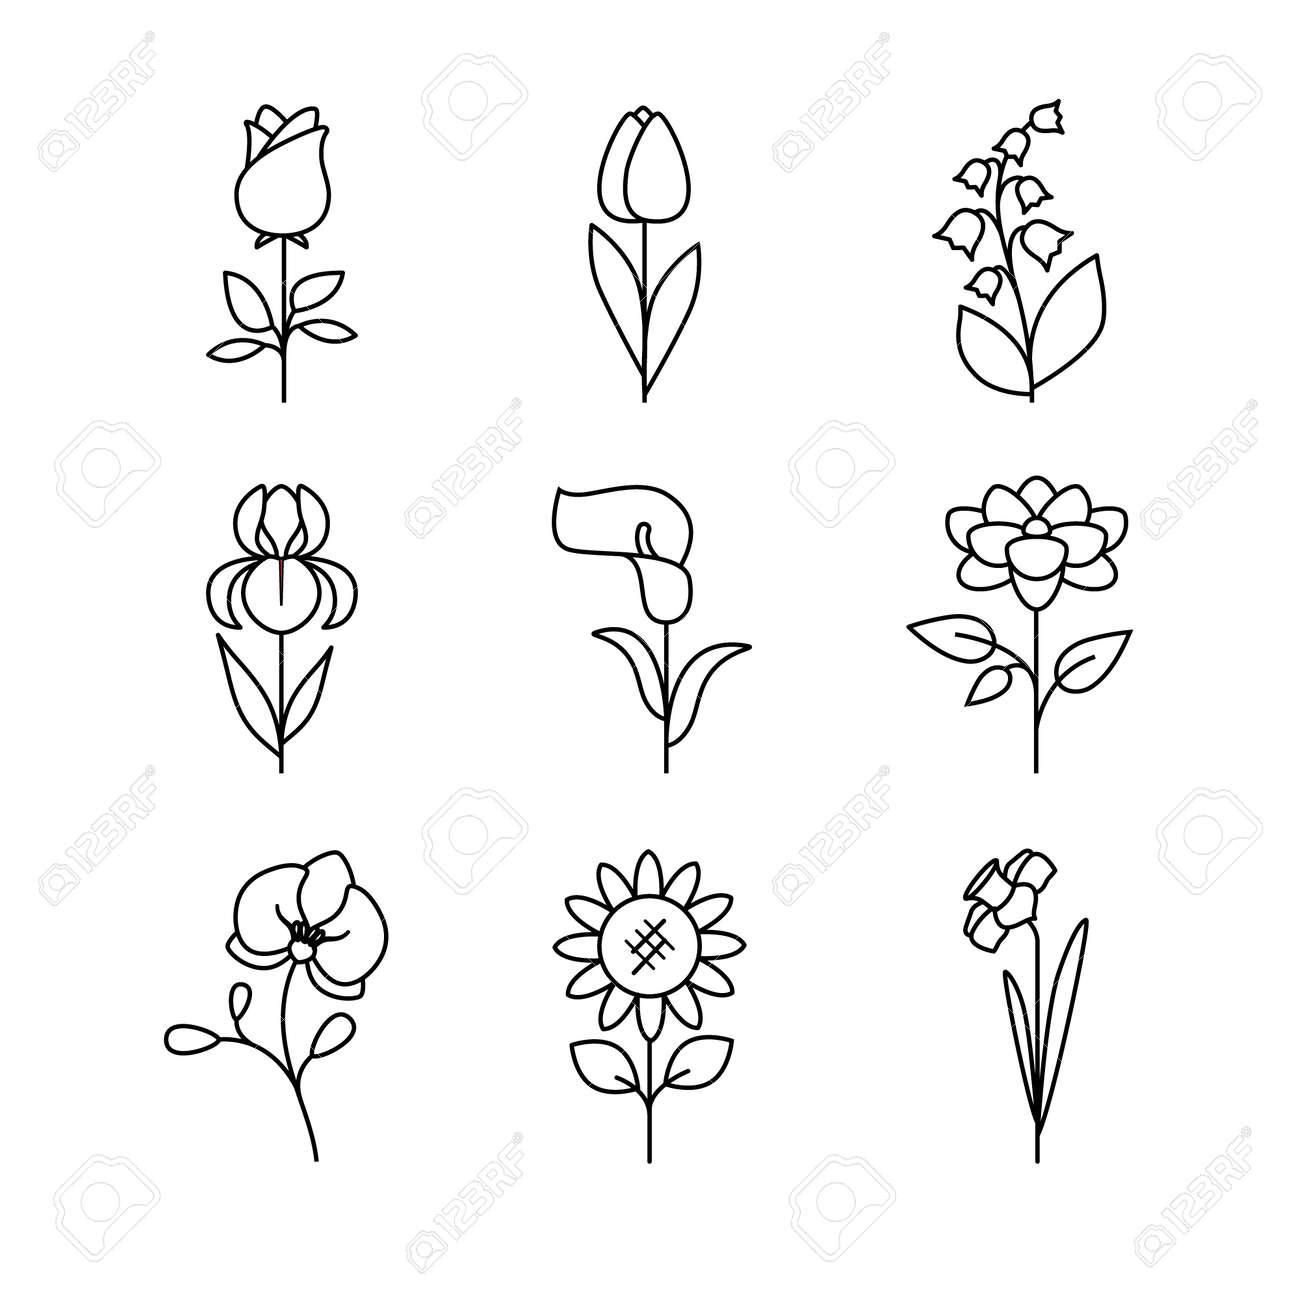 Popular wedding flowers blossoming thin line art icons set popular wedding flowers blossoming thin line art icons set modern black symbols isolated on biocorpaavc